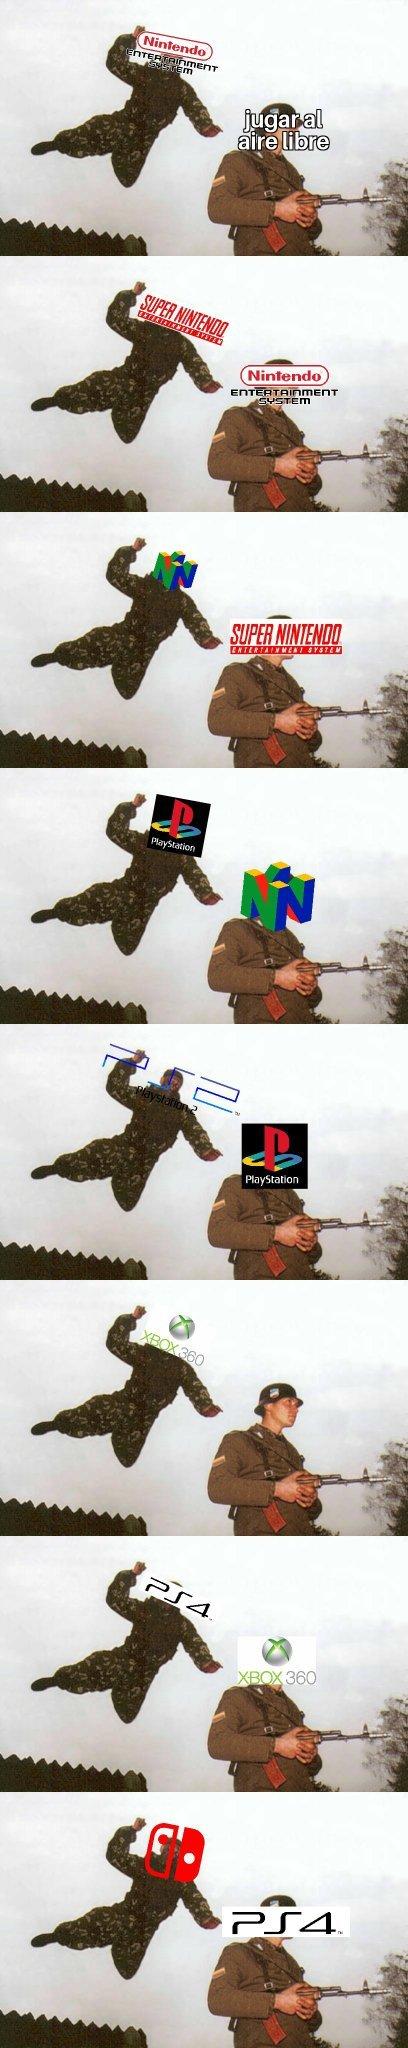 Evolución de las consolas - meme